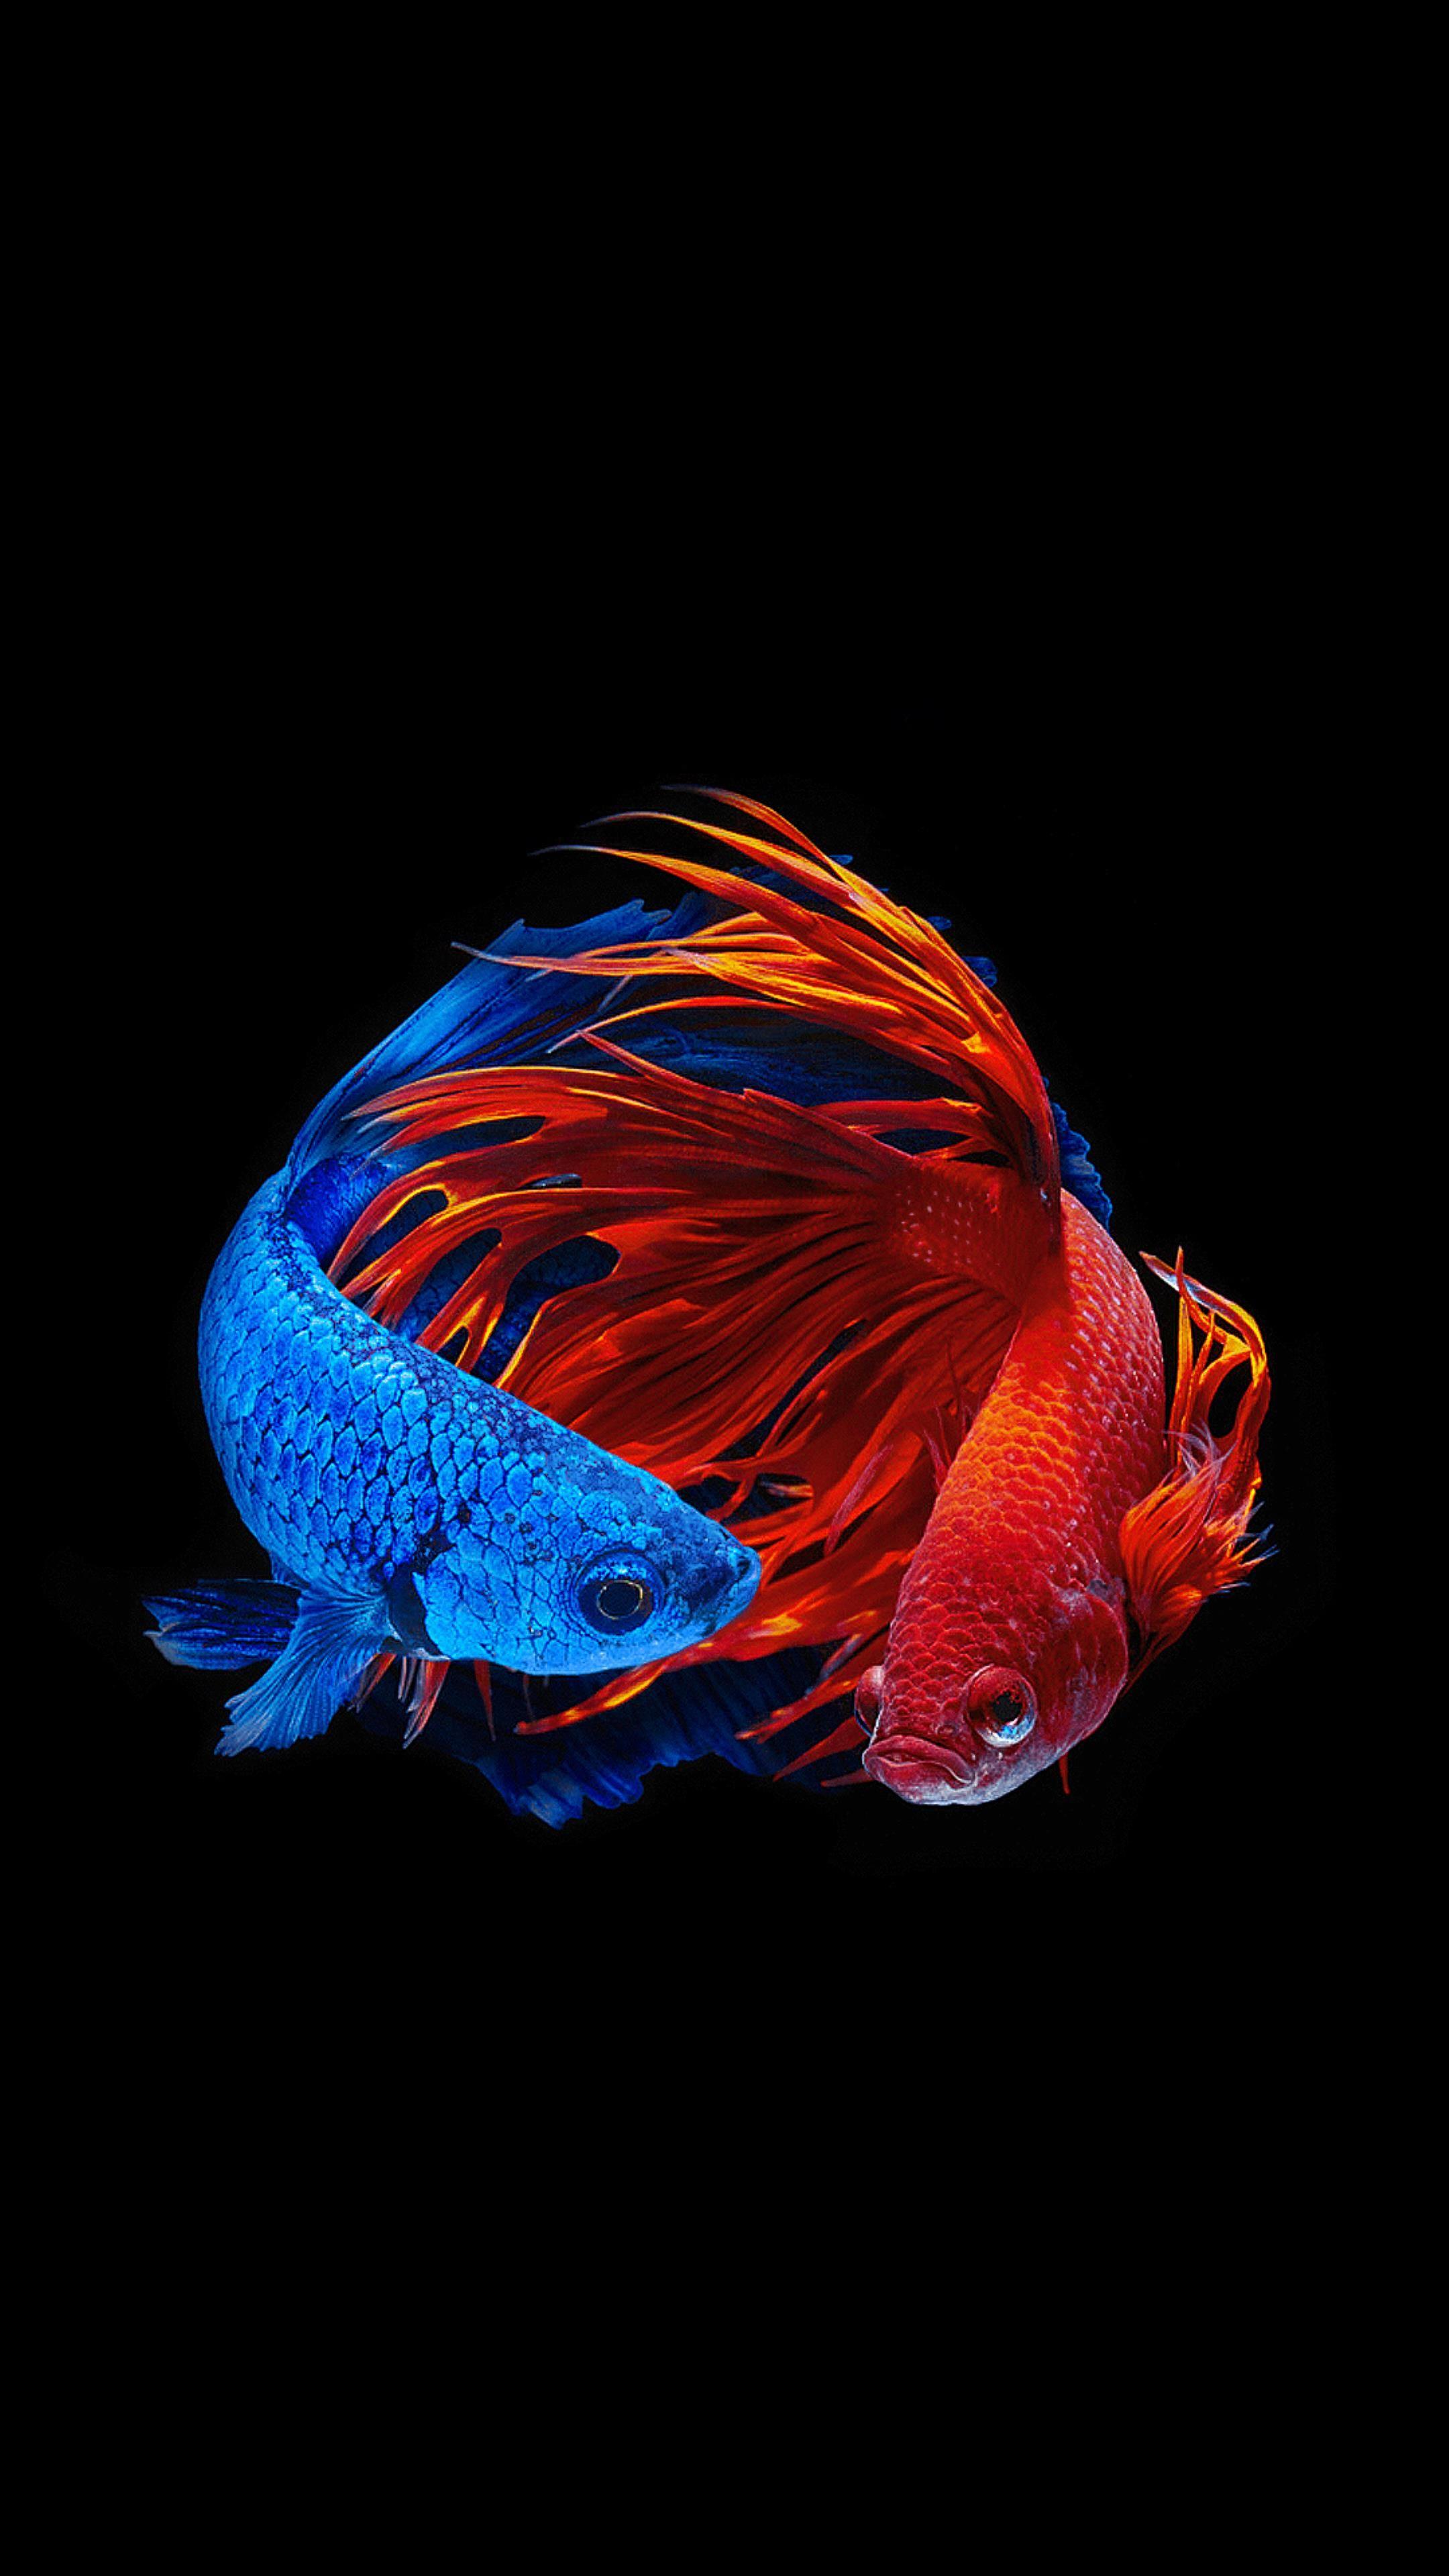 Amoled Animal Wallpaper Ikan Cupang Binatang Ikan Akuarium